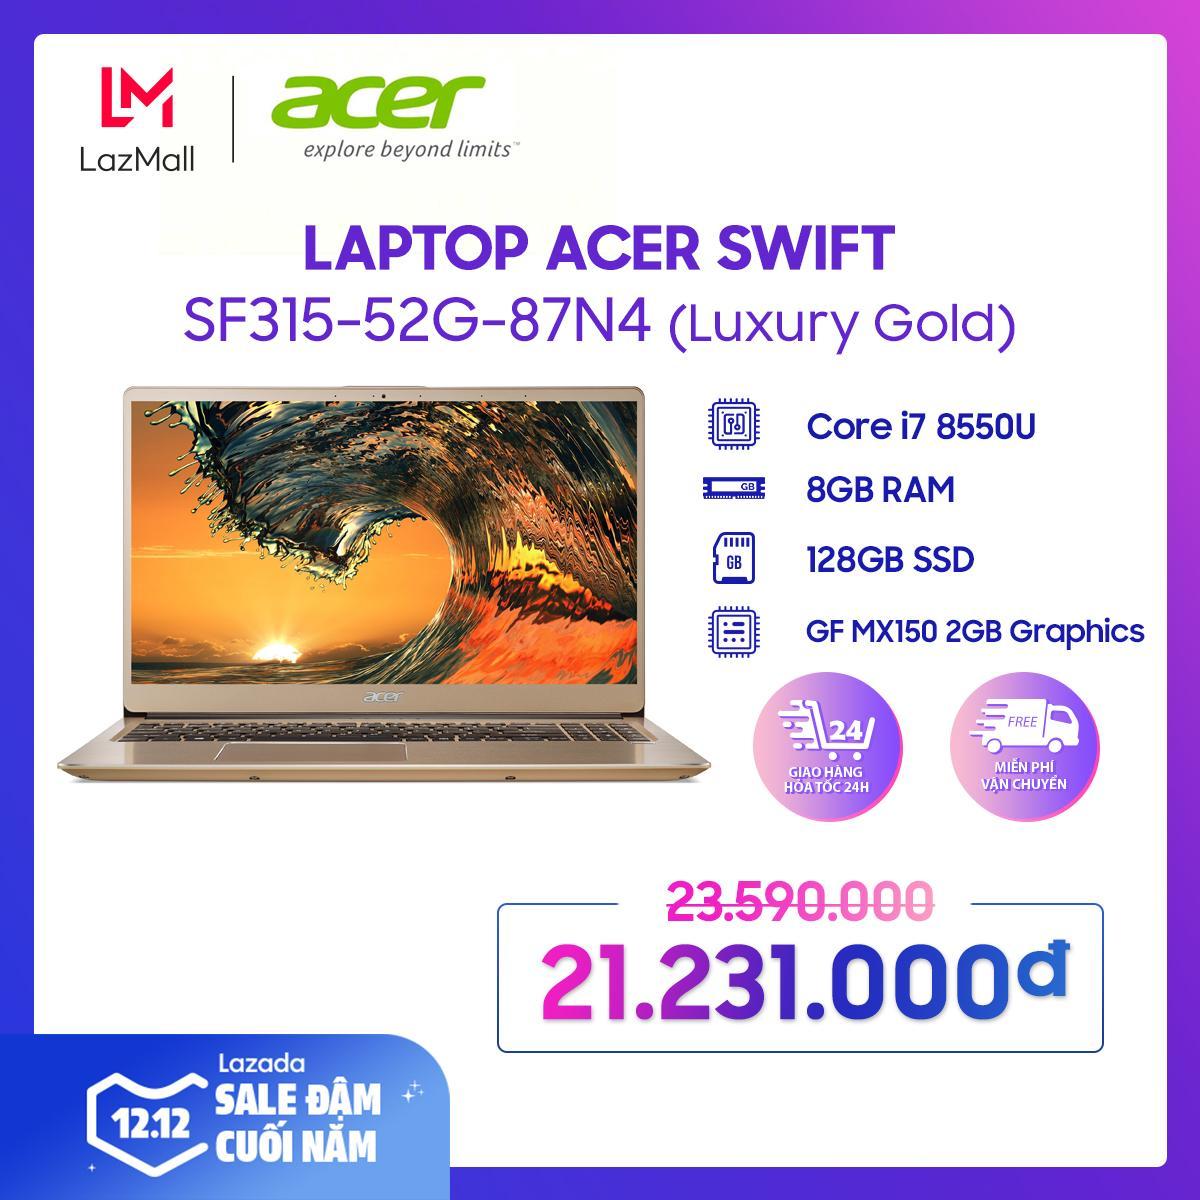 Offer Giảm Giá Laptop Acer Swift SF315-52G-87N4/ Core I7-8550U(1.80 GHz/8MB)/ 8GBRAMDDR4/ 128GBSSD/ GFMX150-2G/ 15.6 FHDIPS/ Webcam/ Wlan Ac+BT/ FP/ 4cell/ Win 10 Home/ Vàng (Luxury Gold)/ 1Y WTY_NX.GZCSV.005